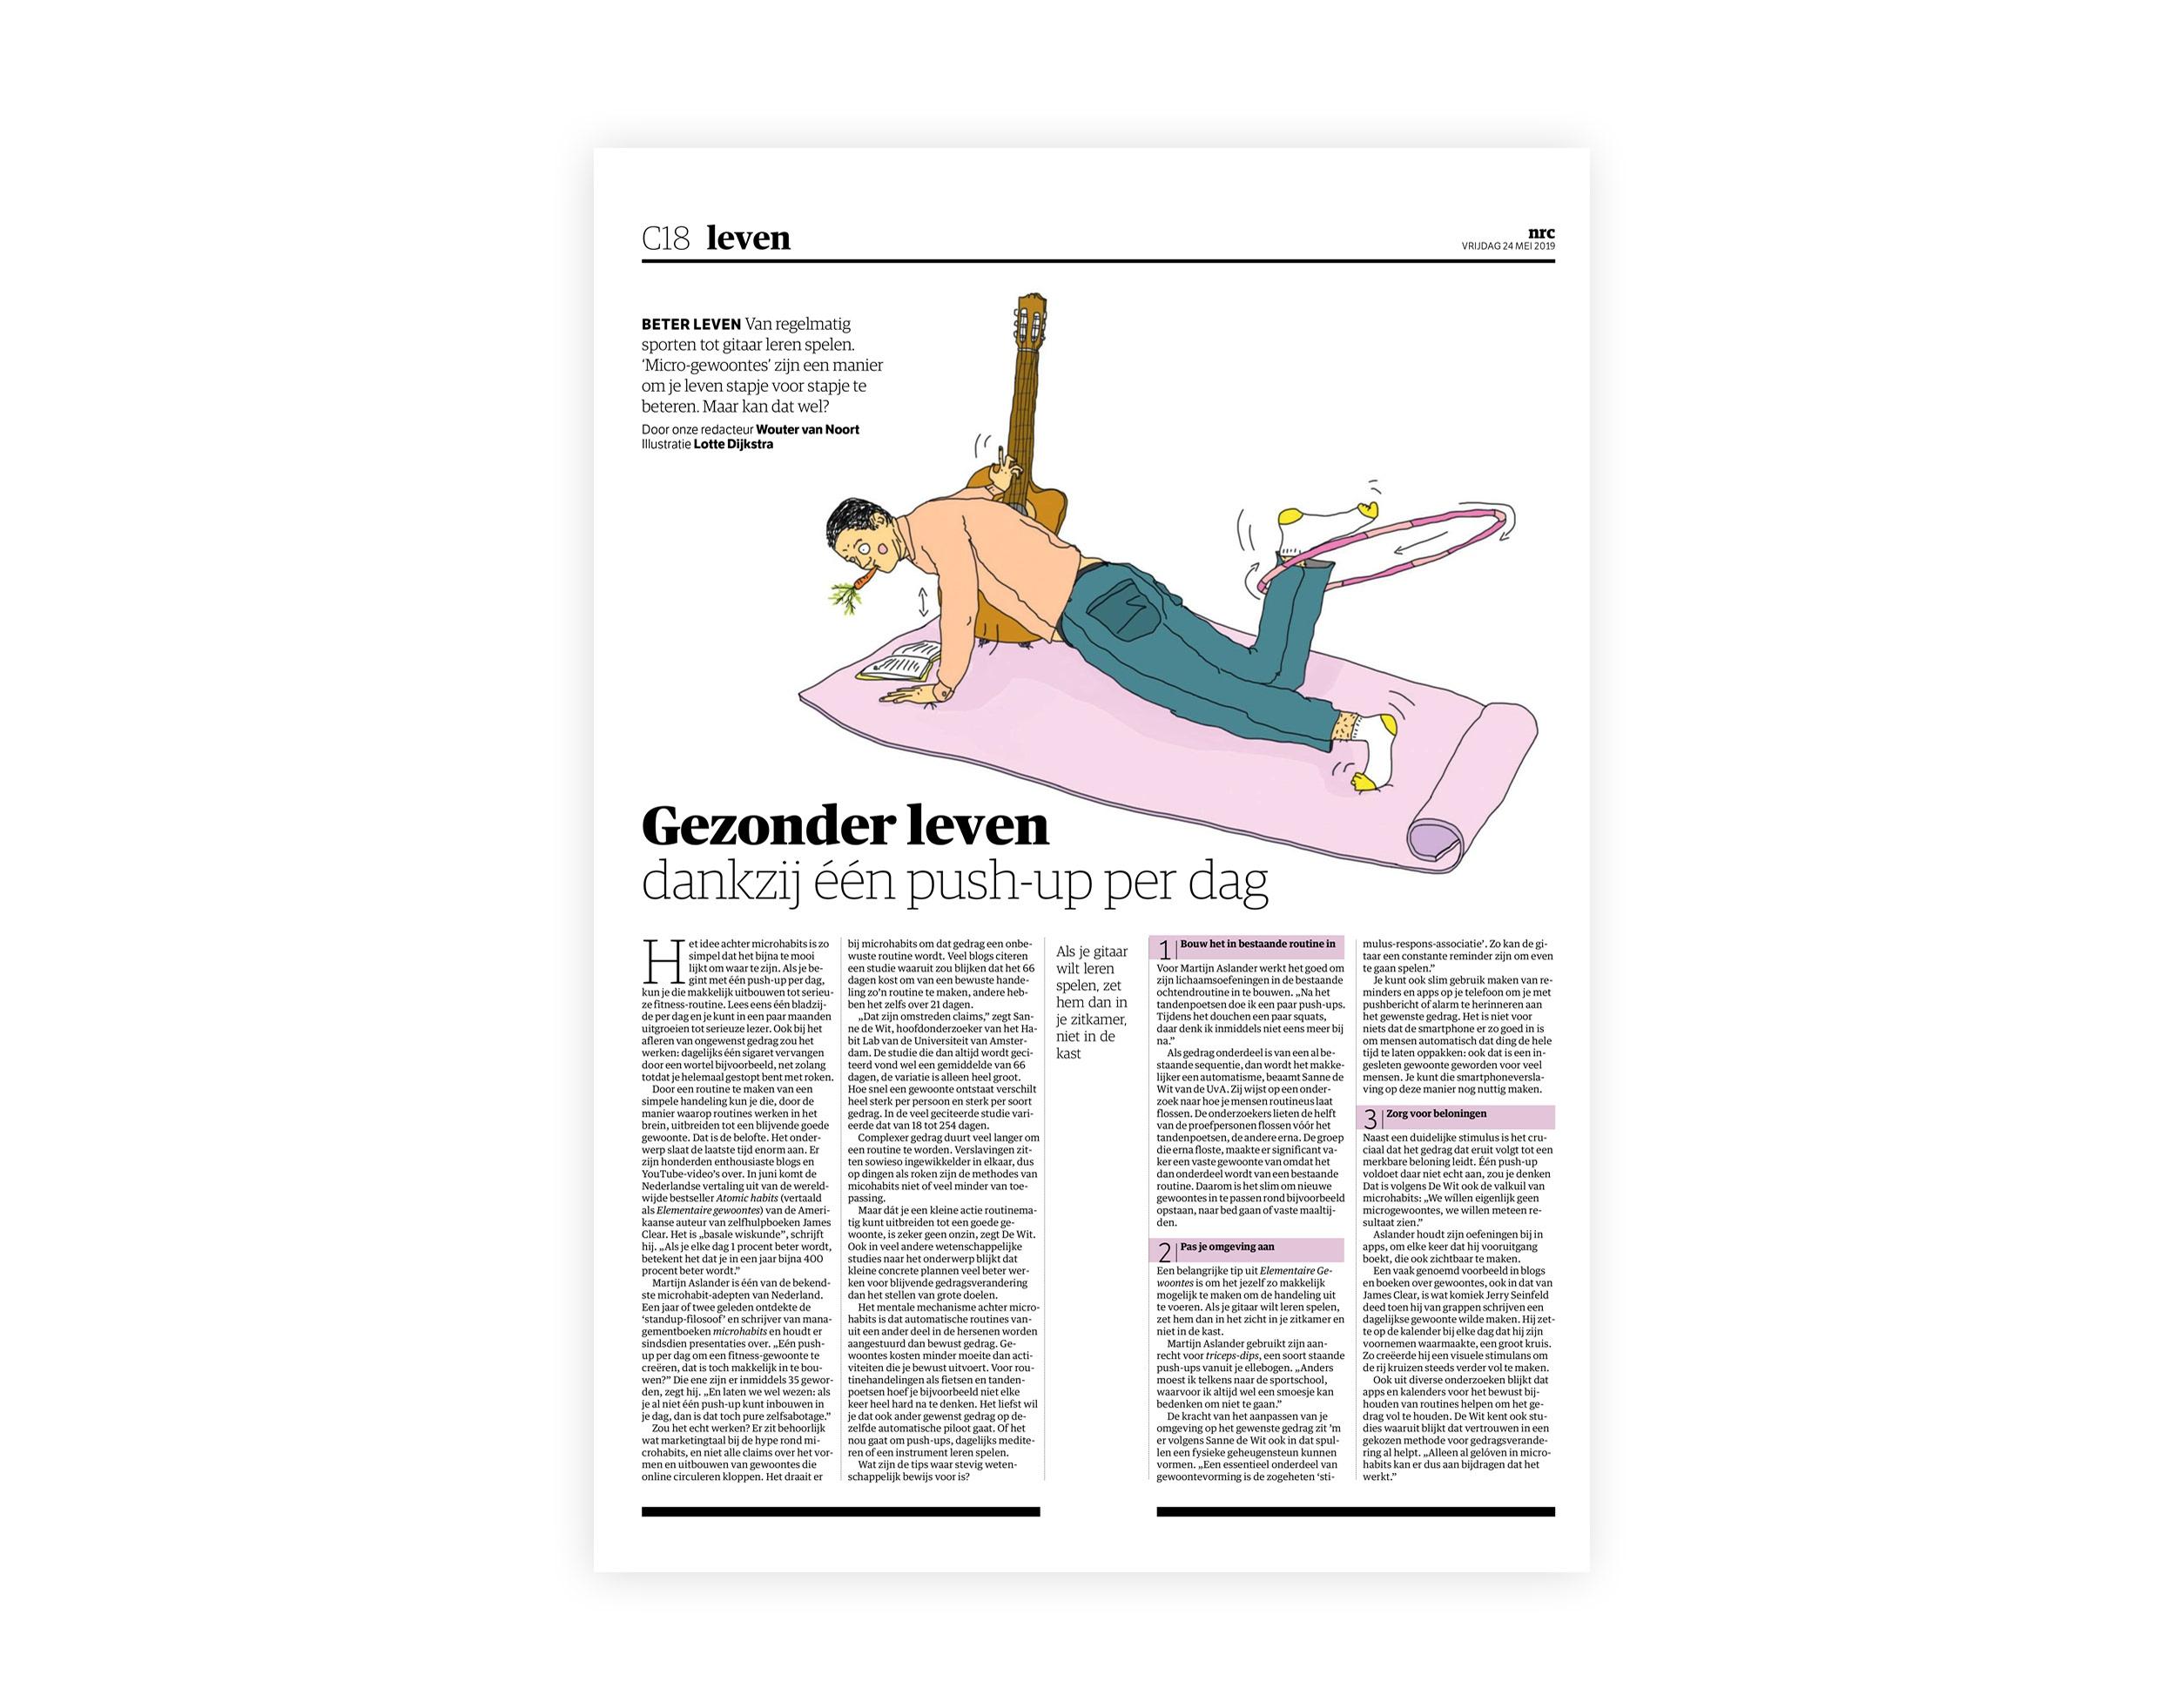 12a24aa9eab7f7 Publicaties Projecten Vrij Werk Visual Notes Over Lotte Contact ...